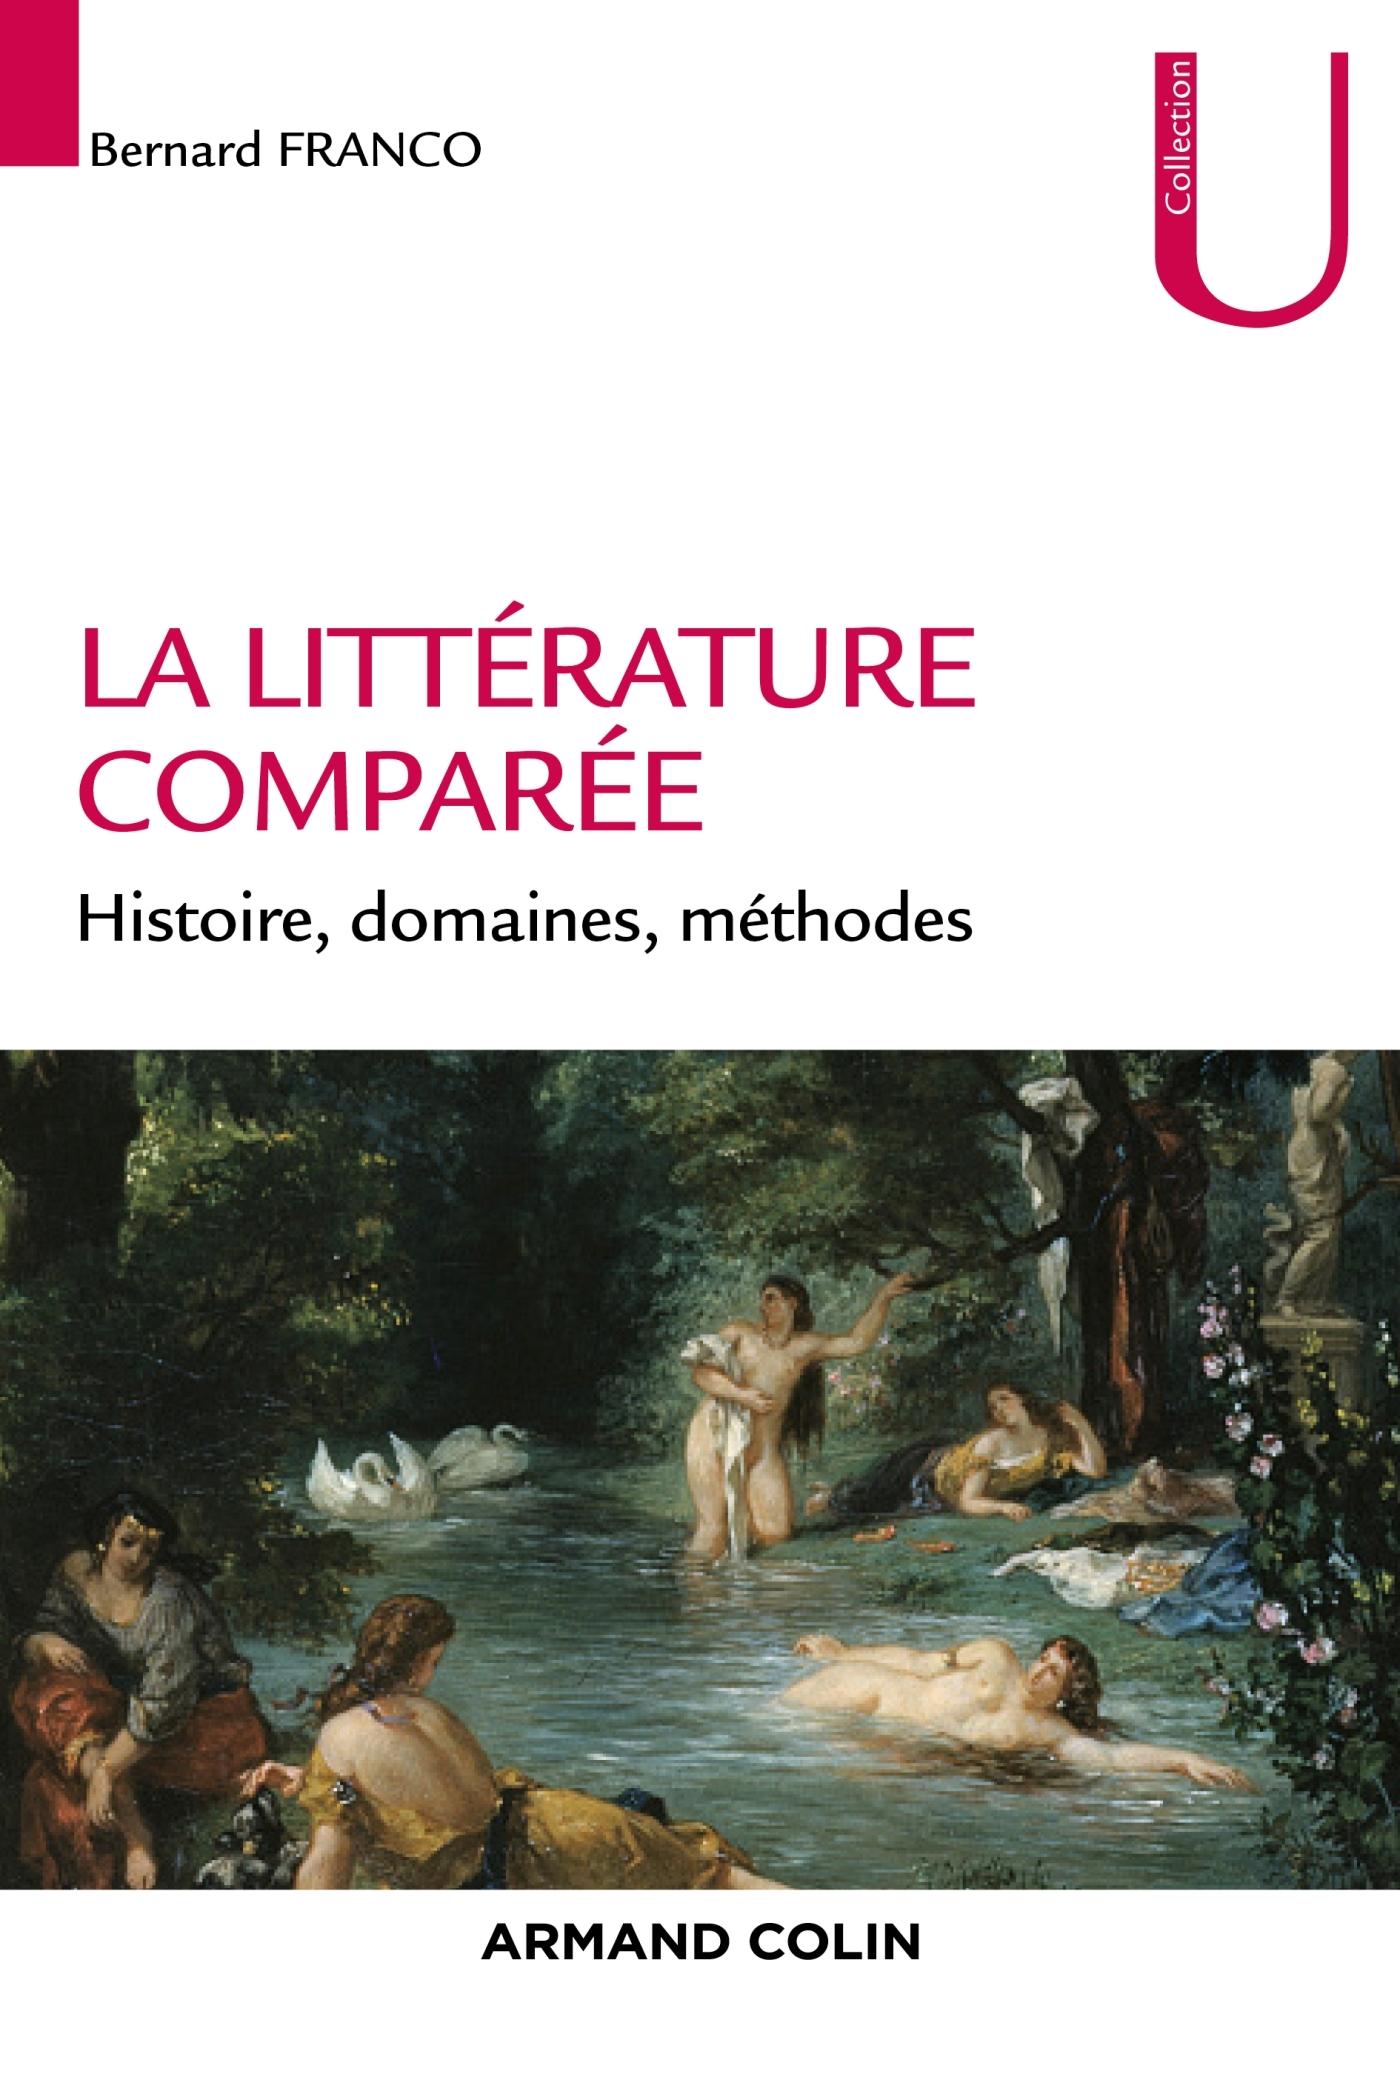 LA LITTERATURE COMPAREE - HISTOIRE, DOMAINES, METHODES